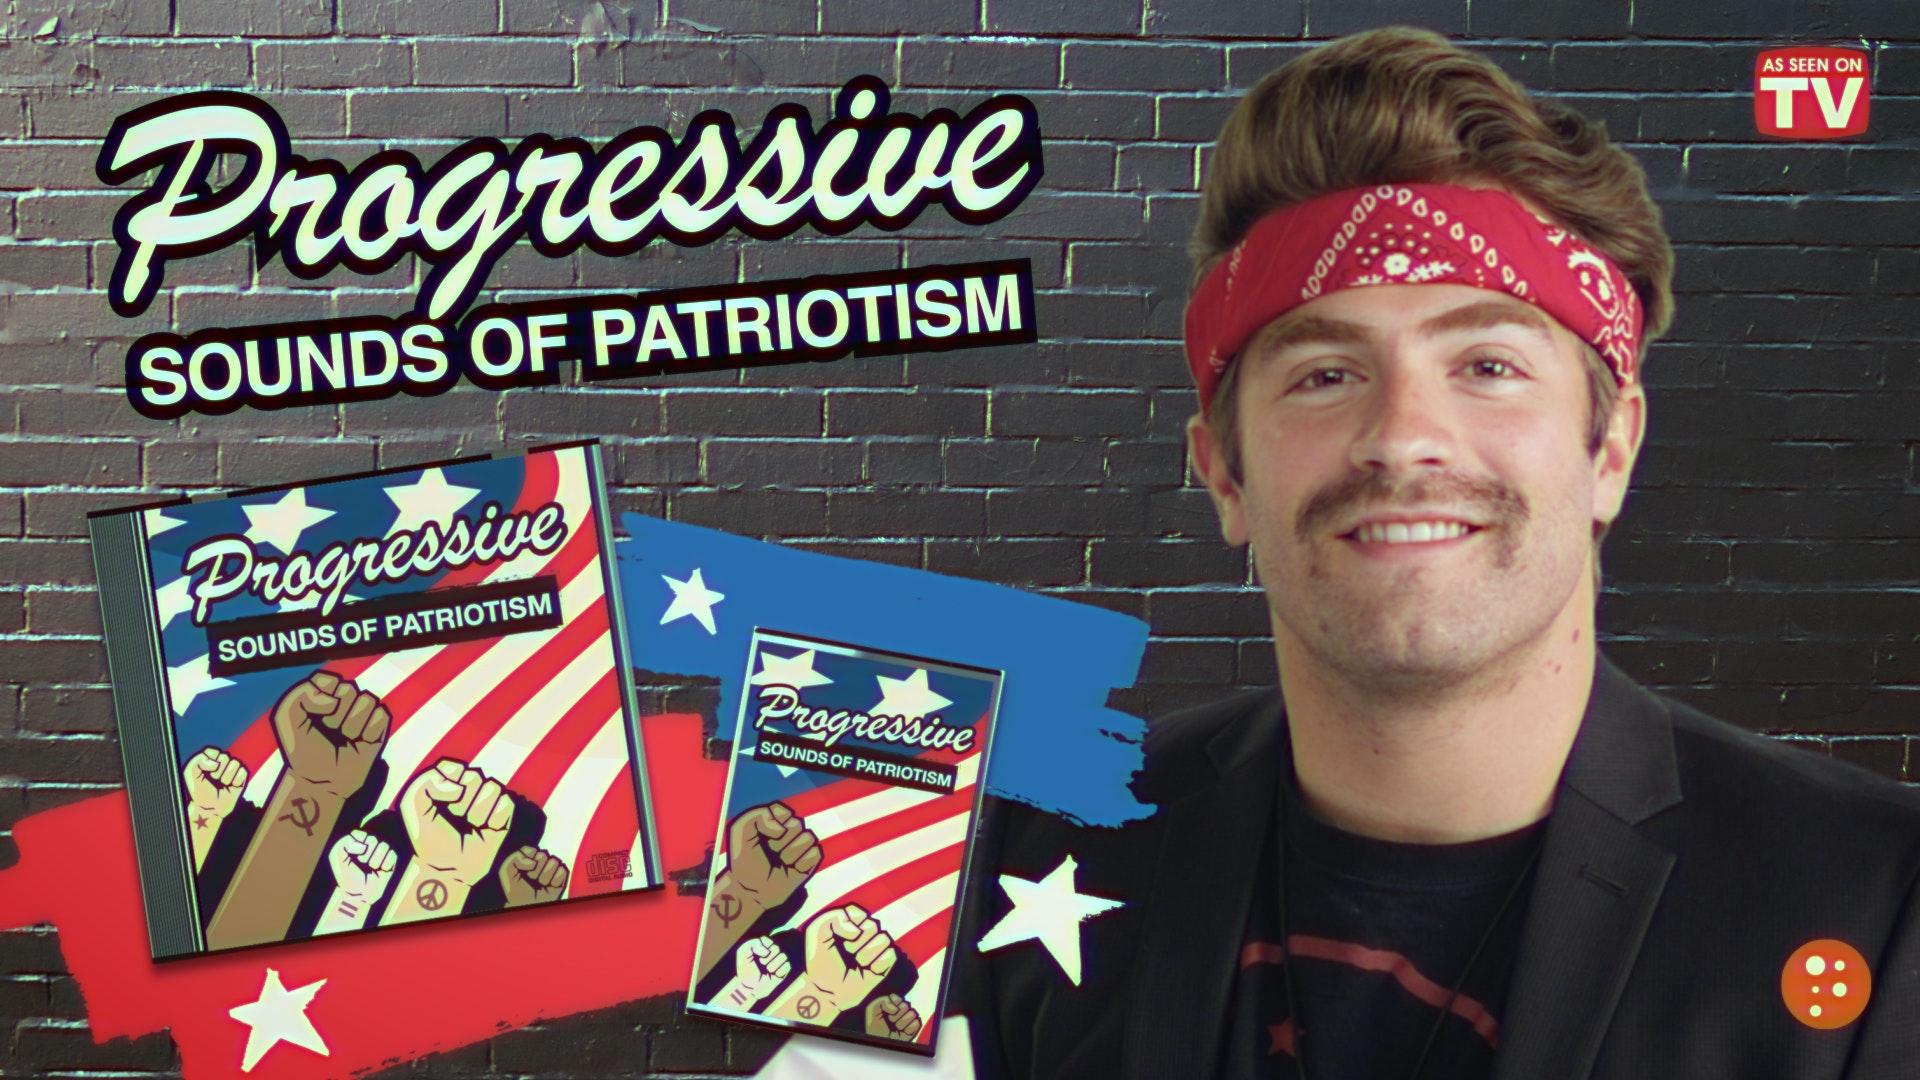 Progressive Sounds of Patriotism